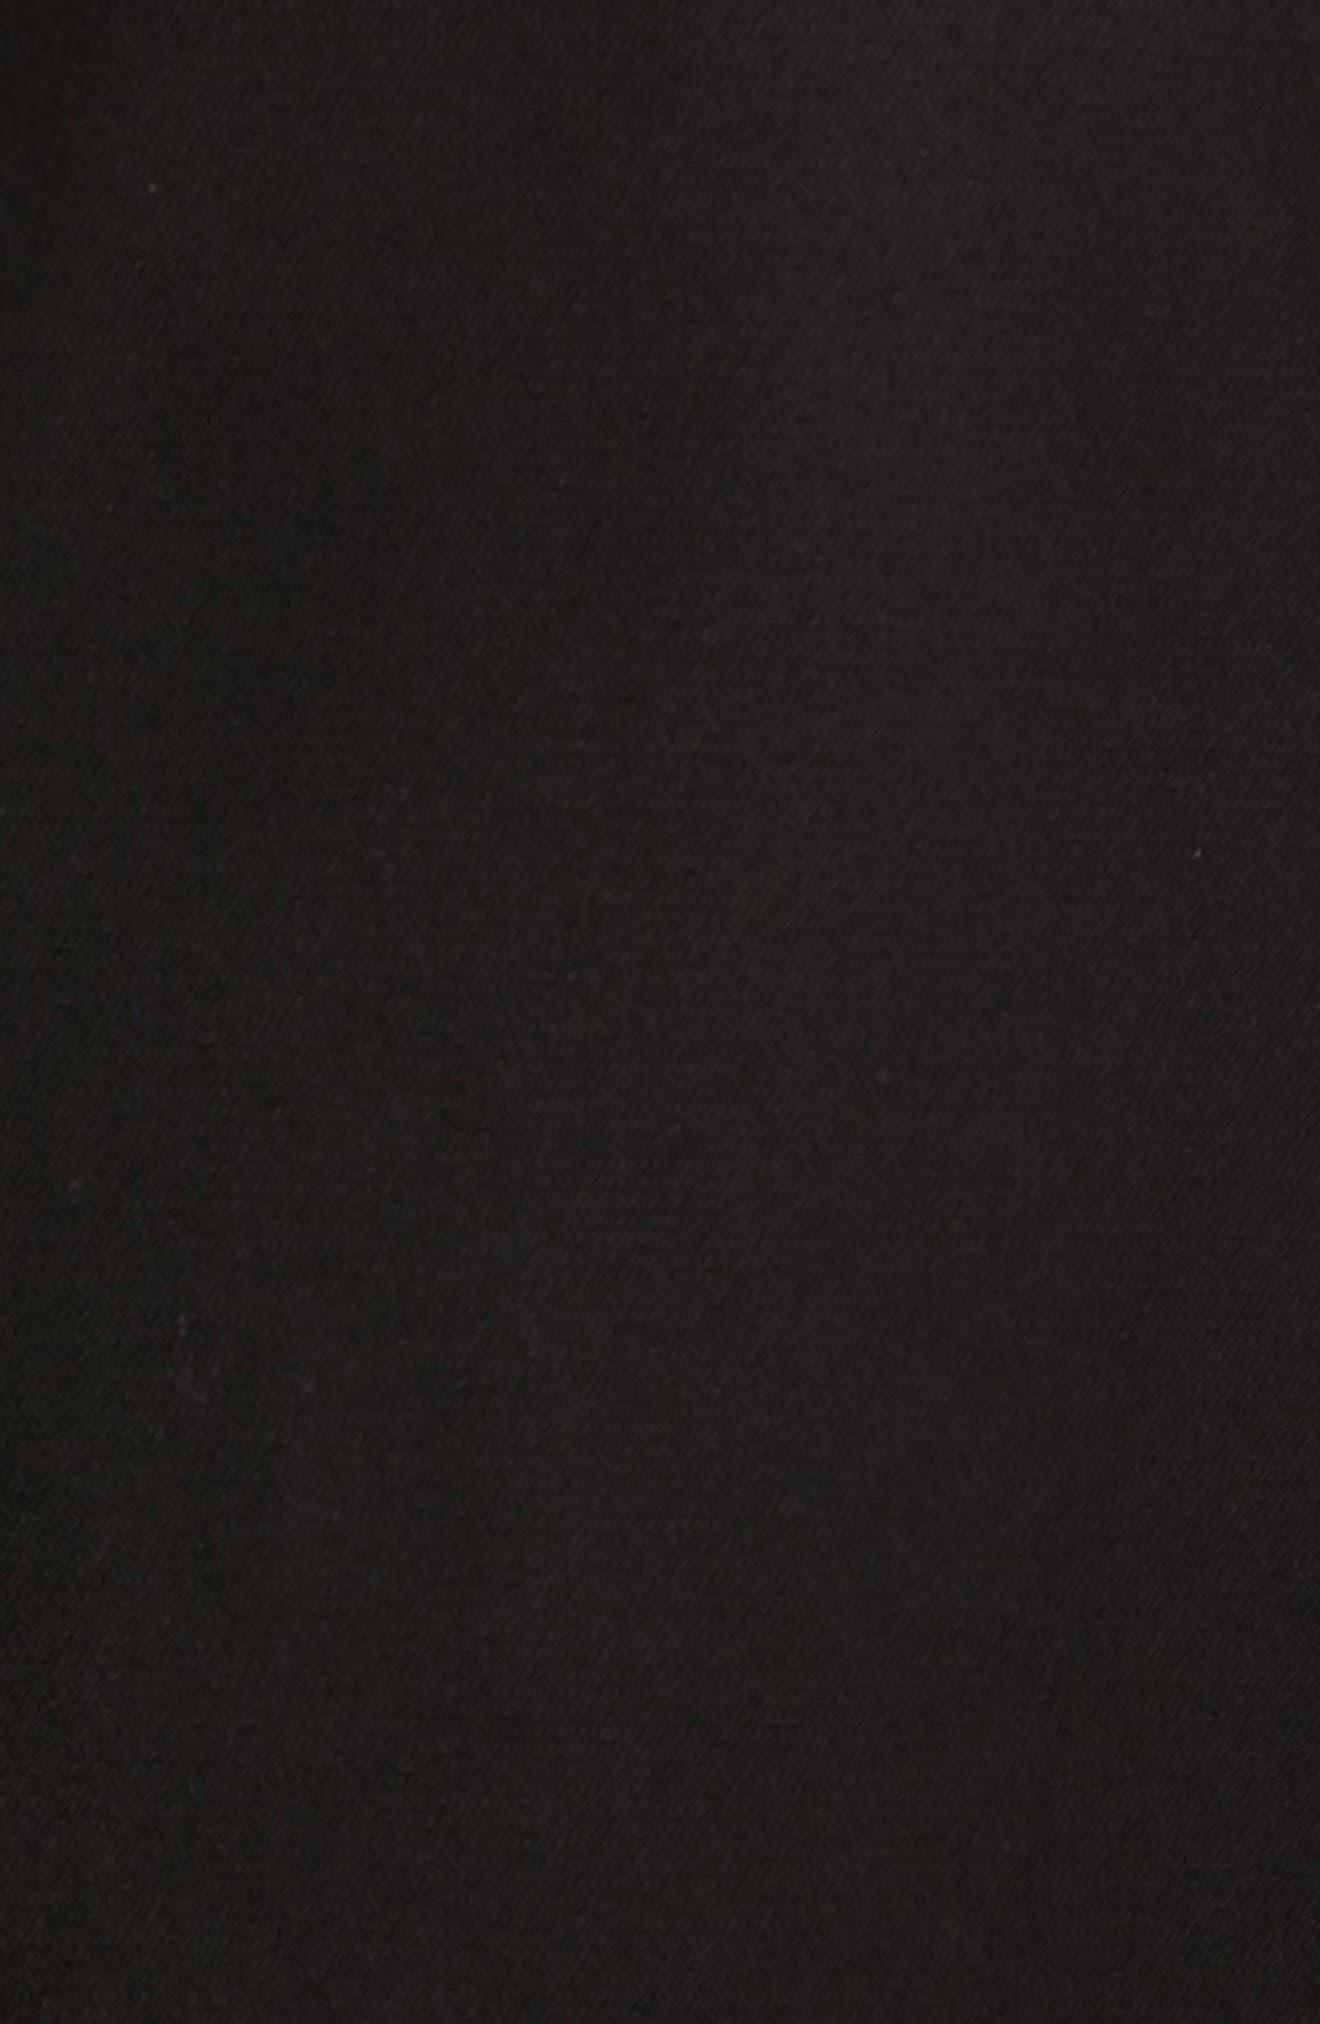 Oroy Regular Fit Field Jacket,                             Alternate thumbnail 6, color,                             BLACK